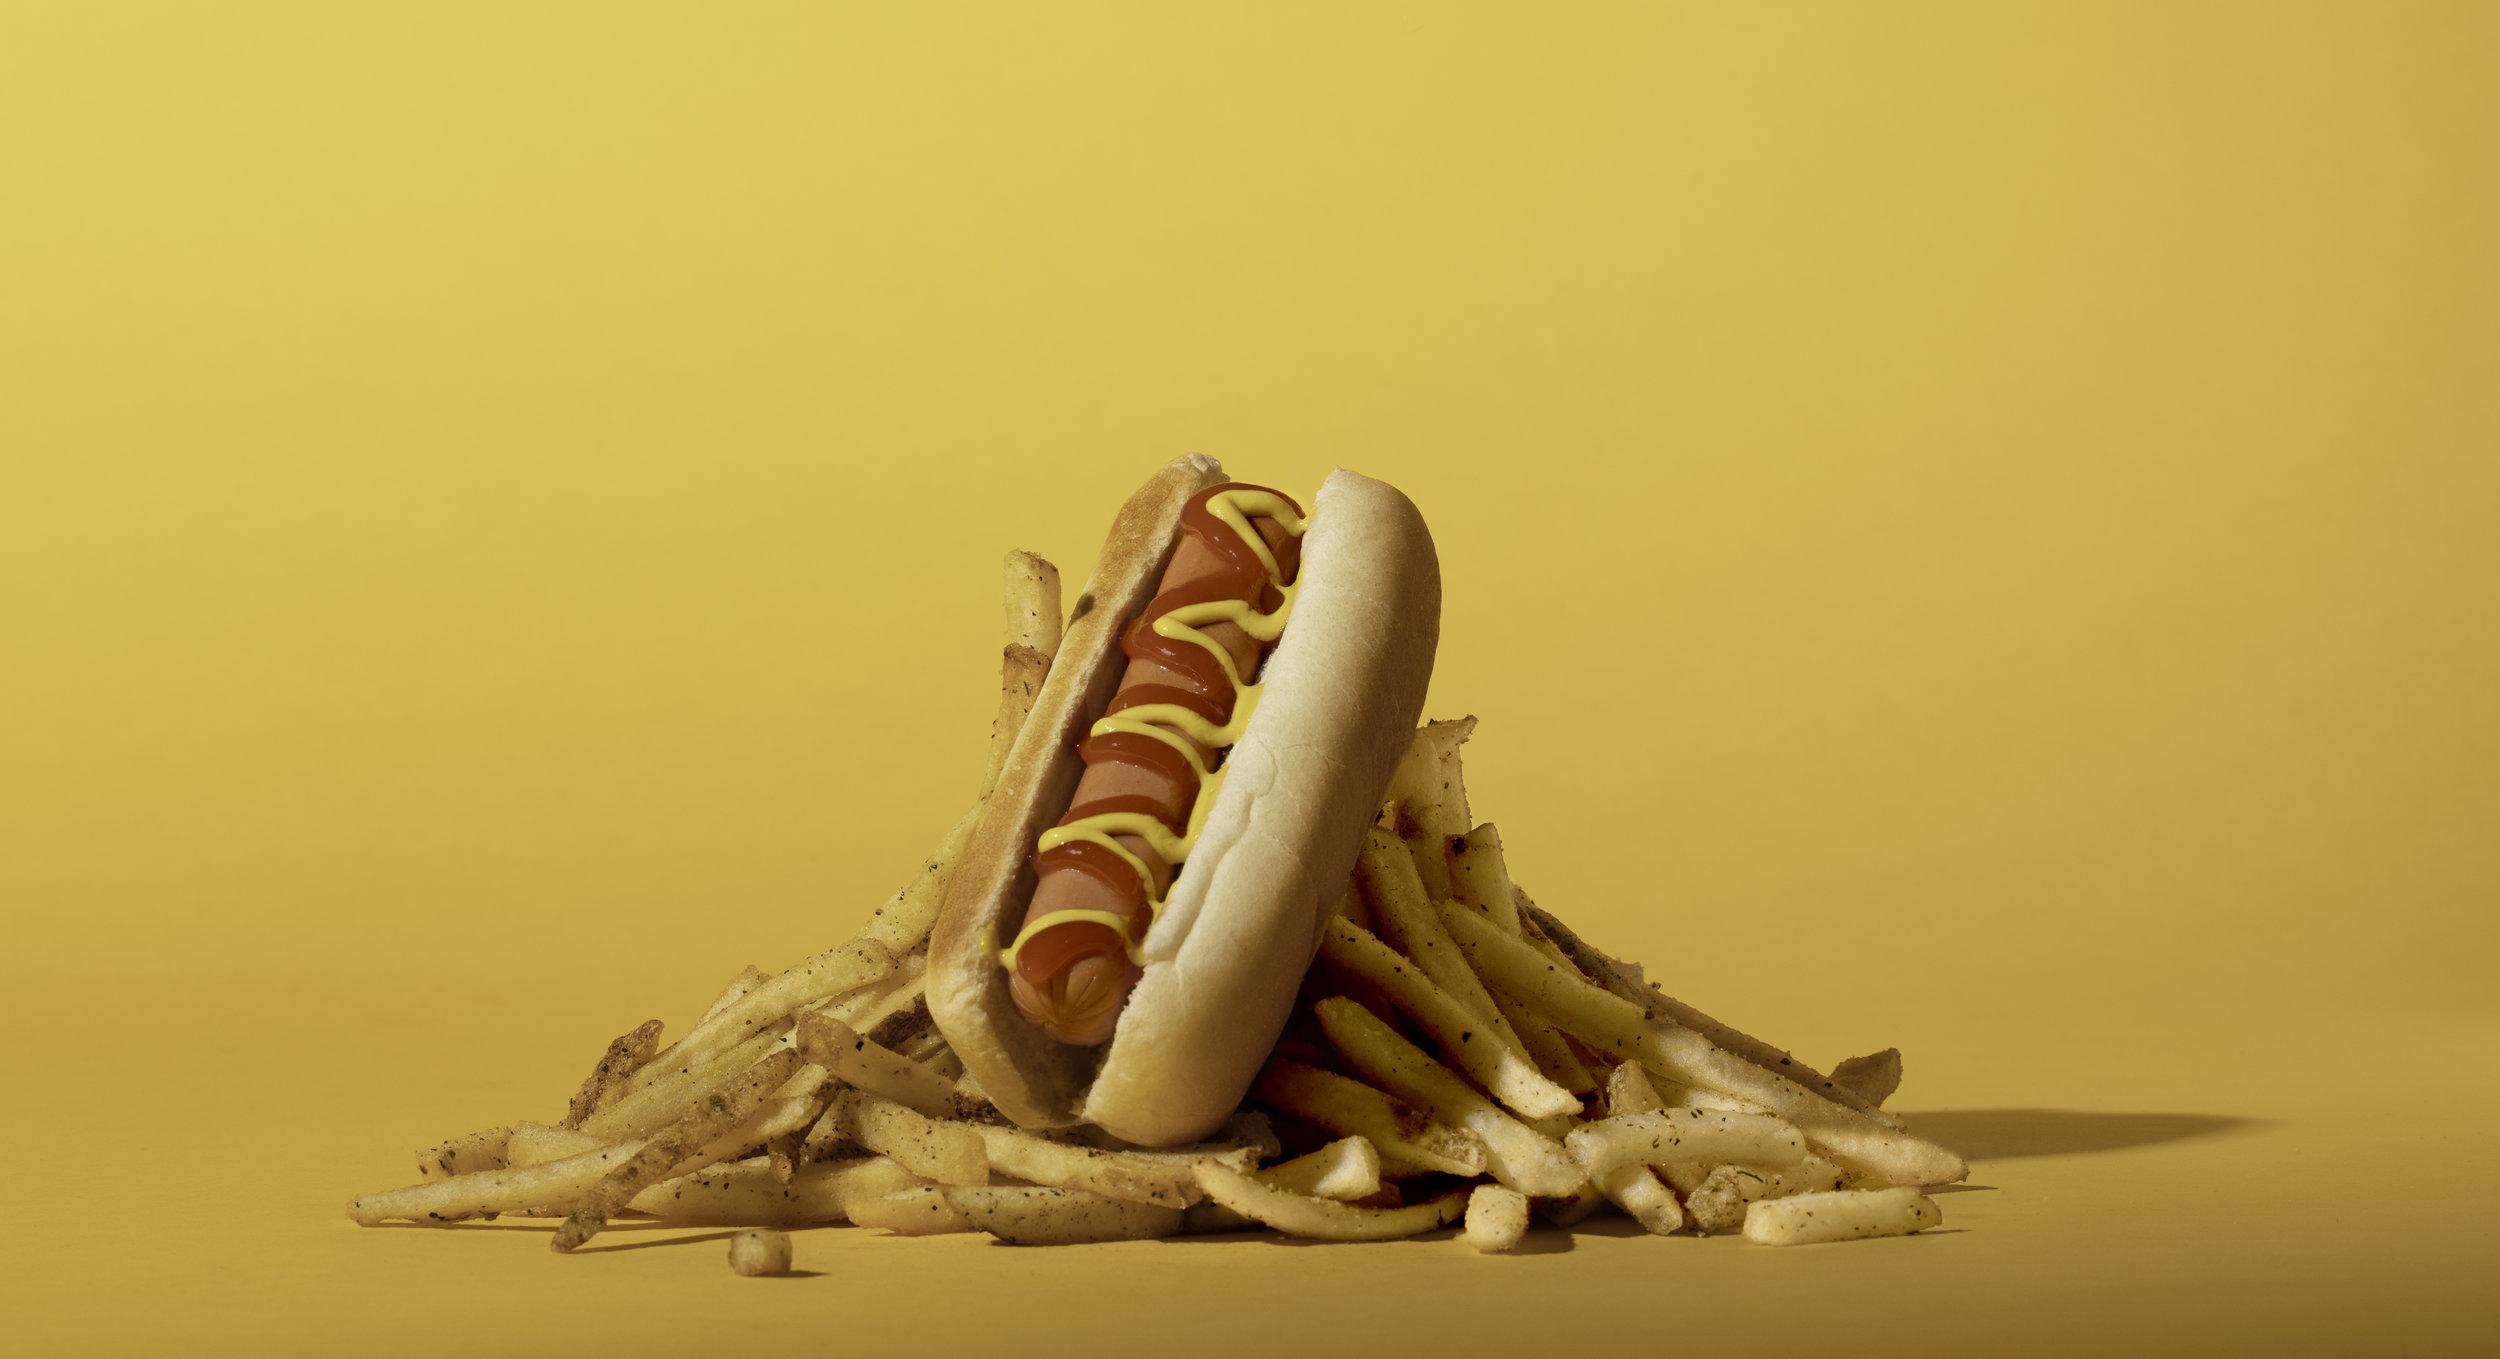 Sup Dog Hot Dog and Fries